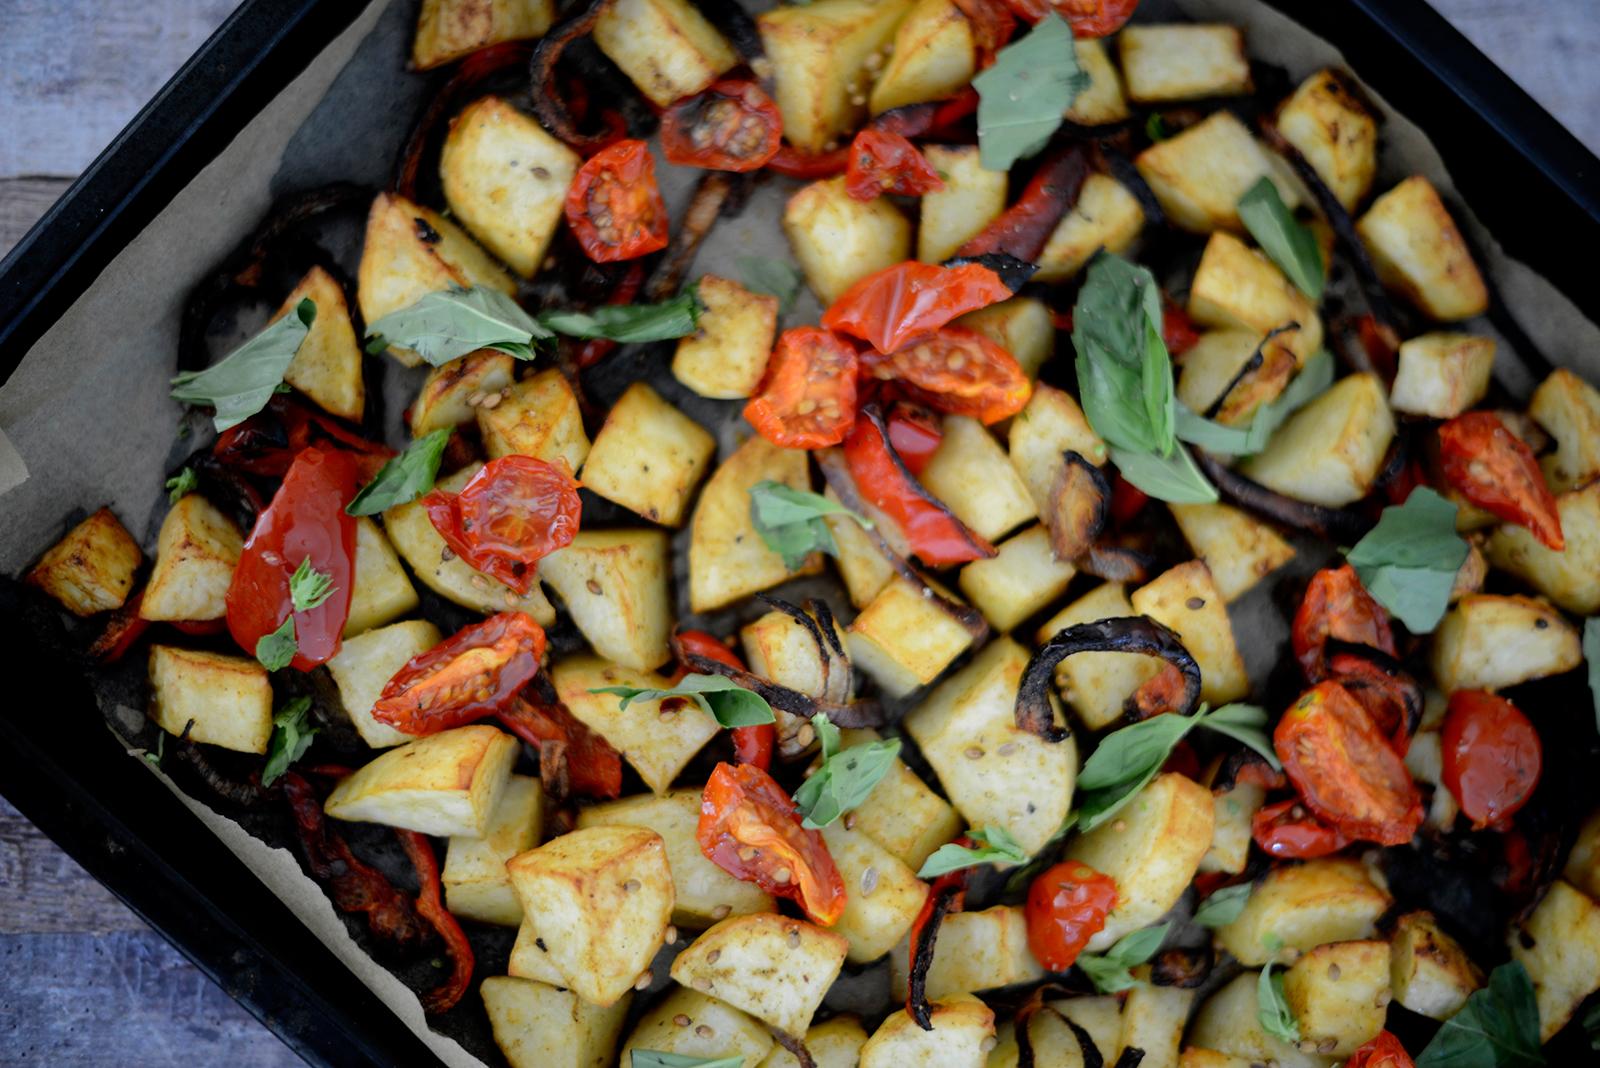 roasted vegetable bake recipe